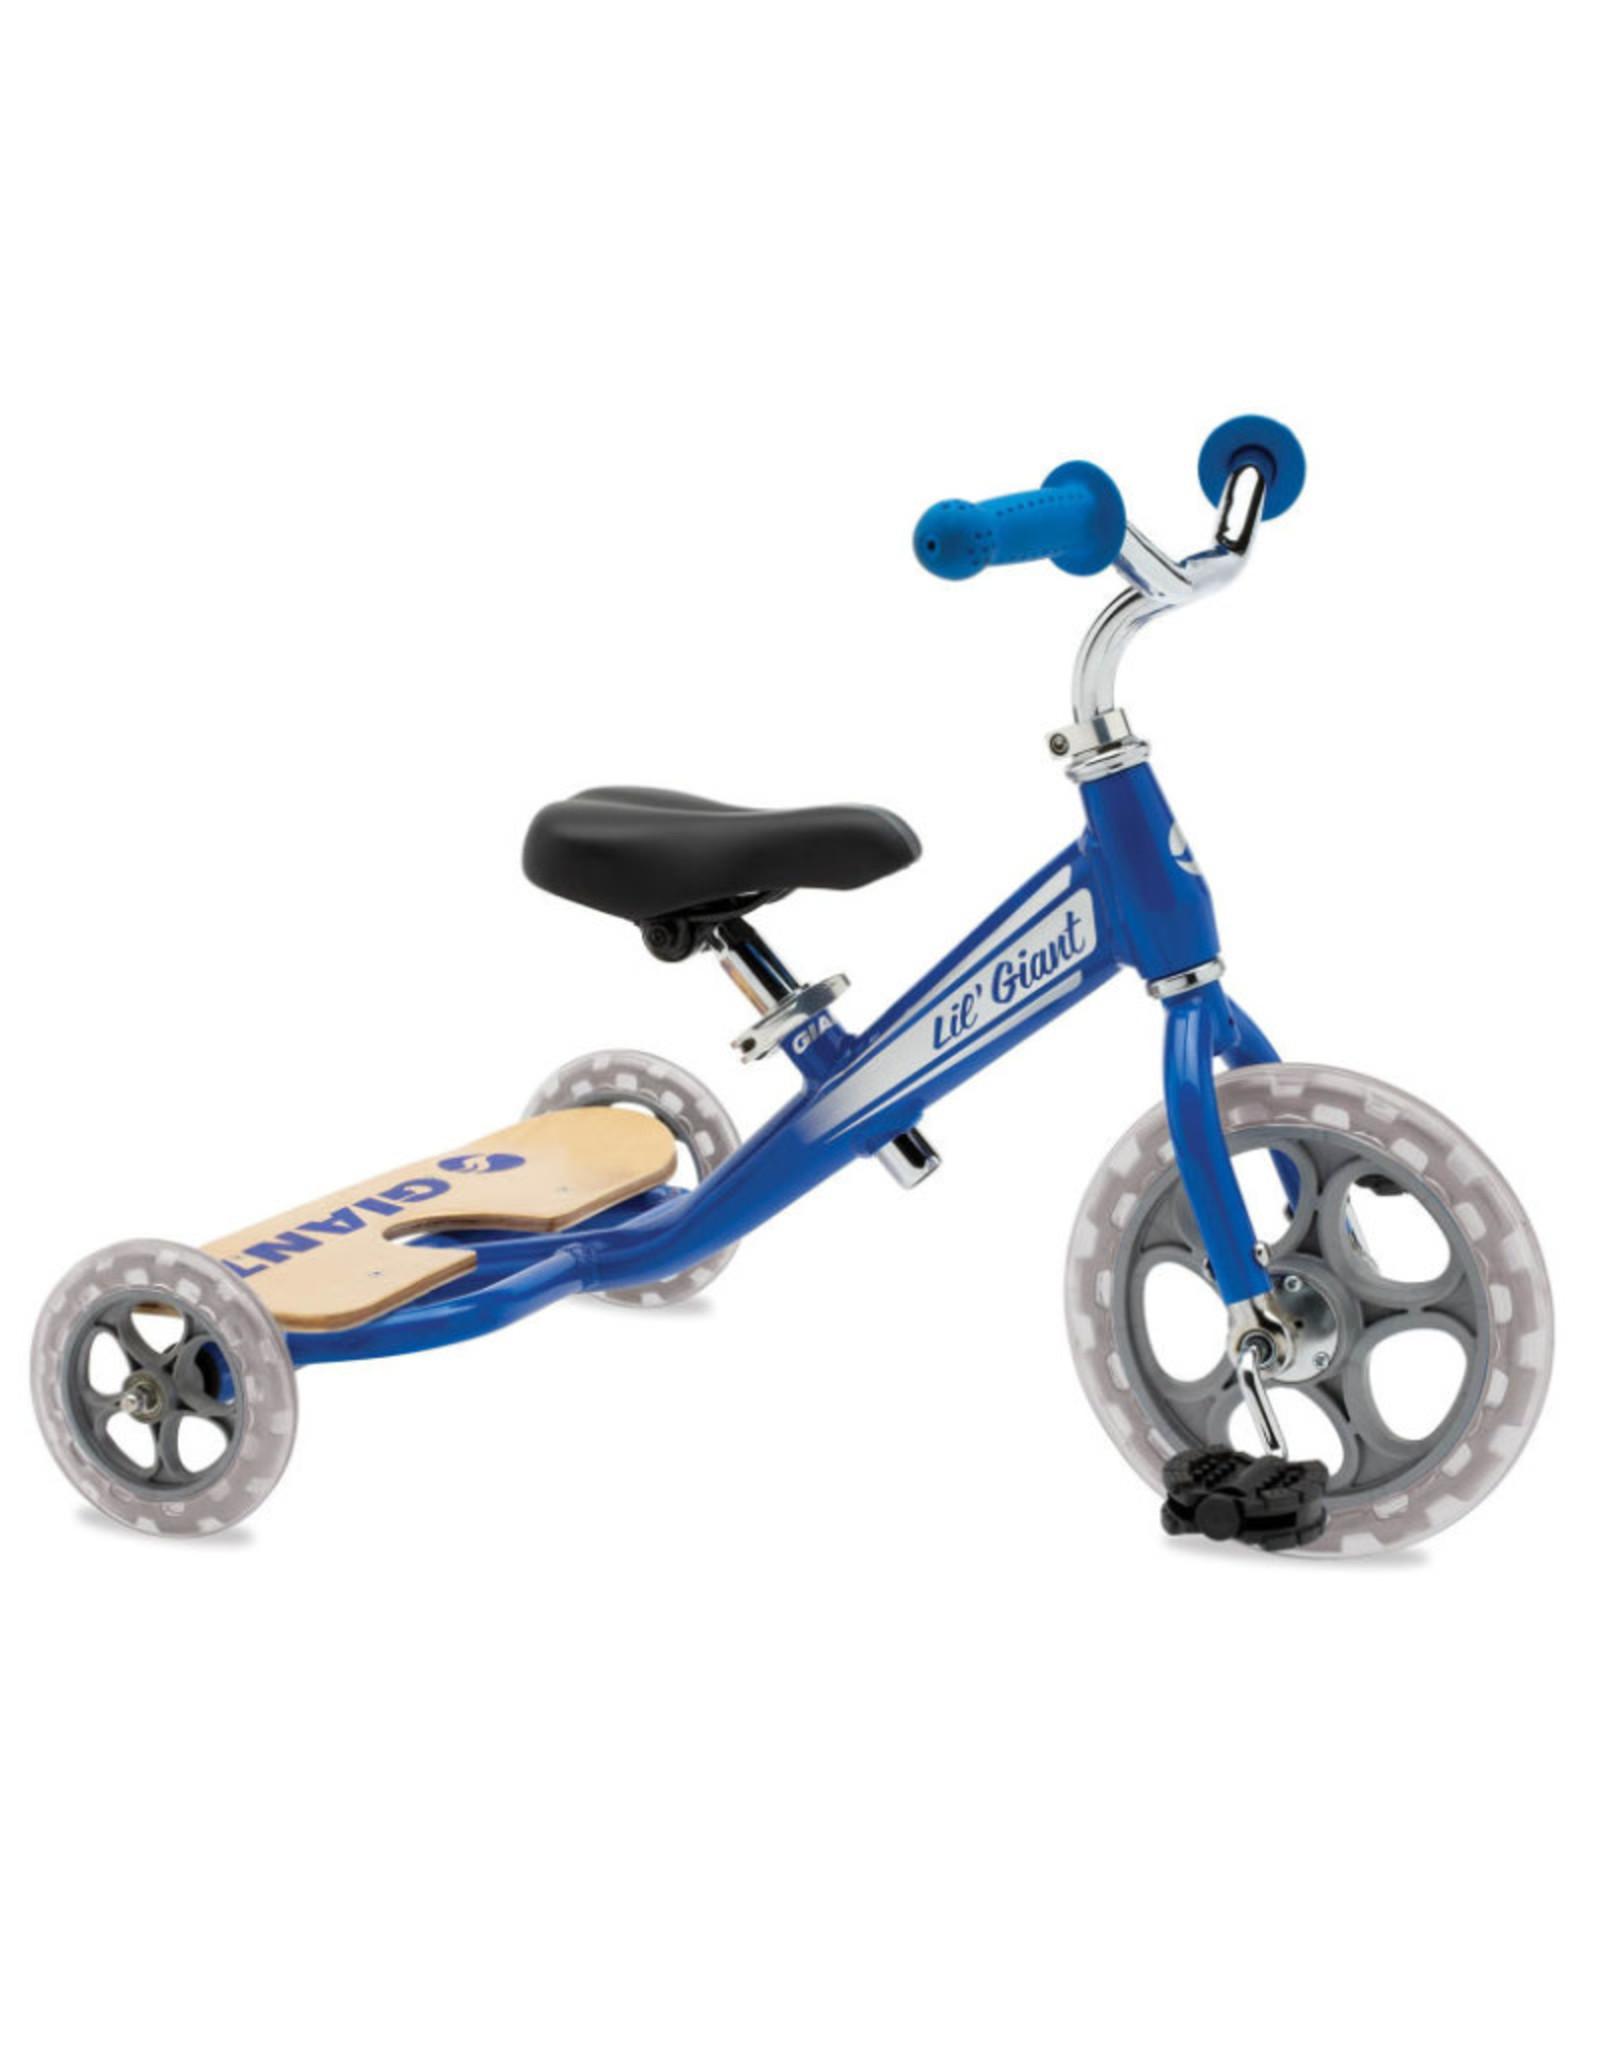 Giant Lil' Giant Trike Blue